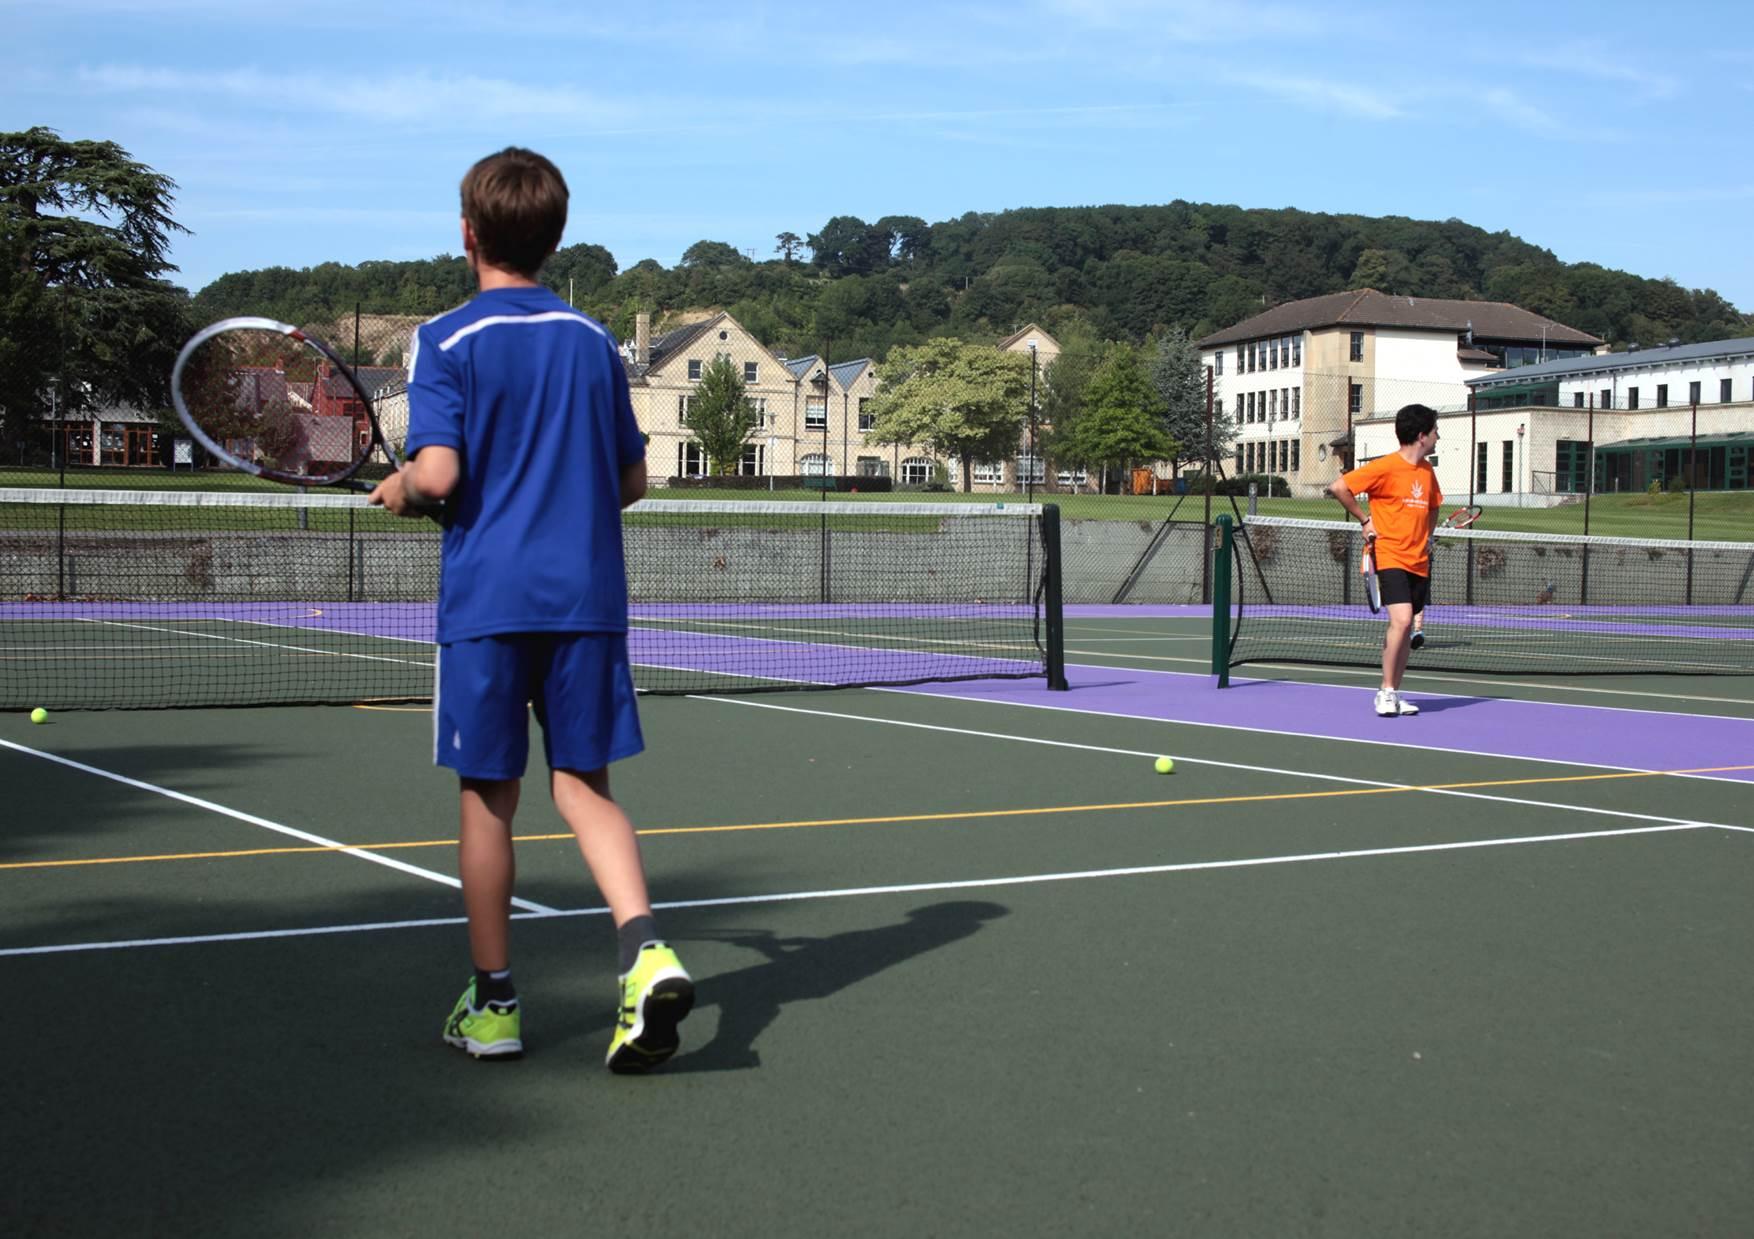 027. Tennis